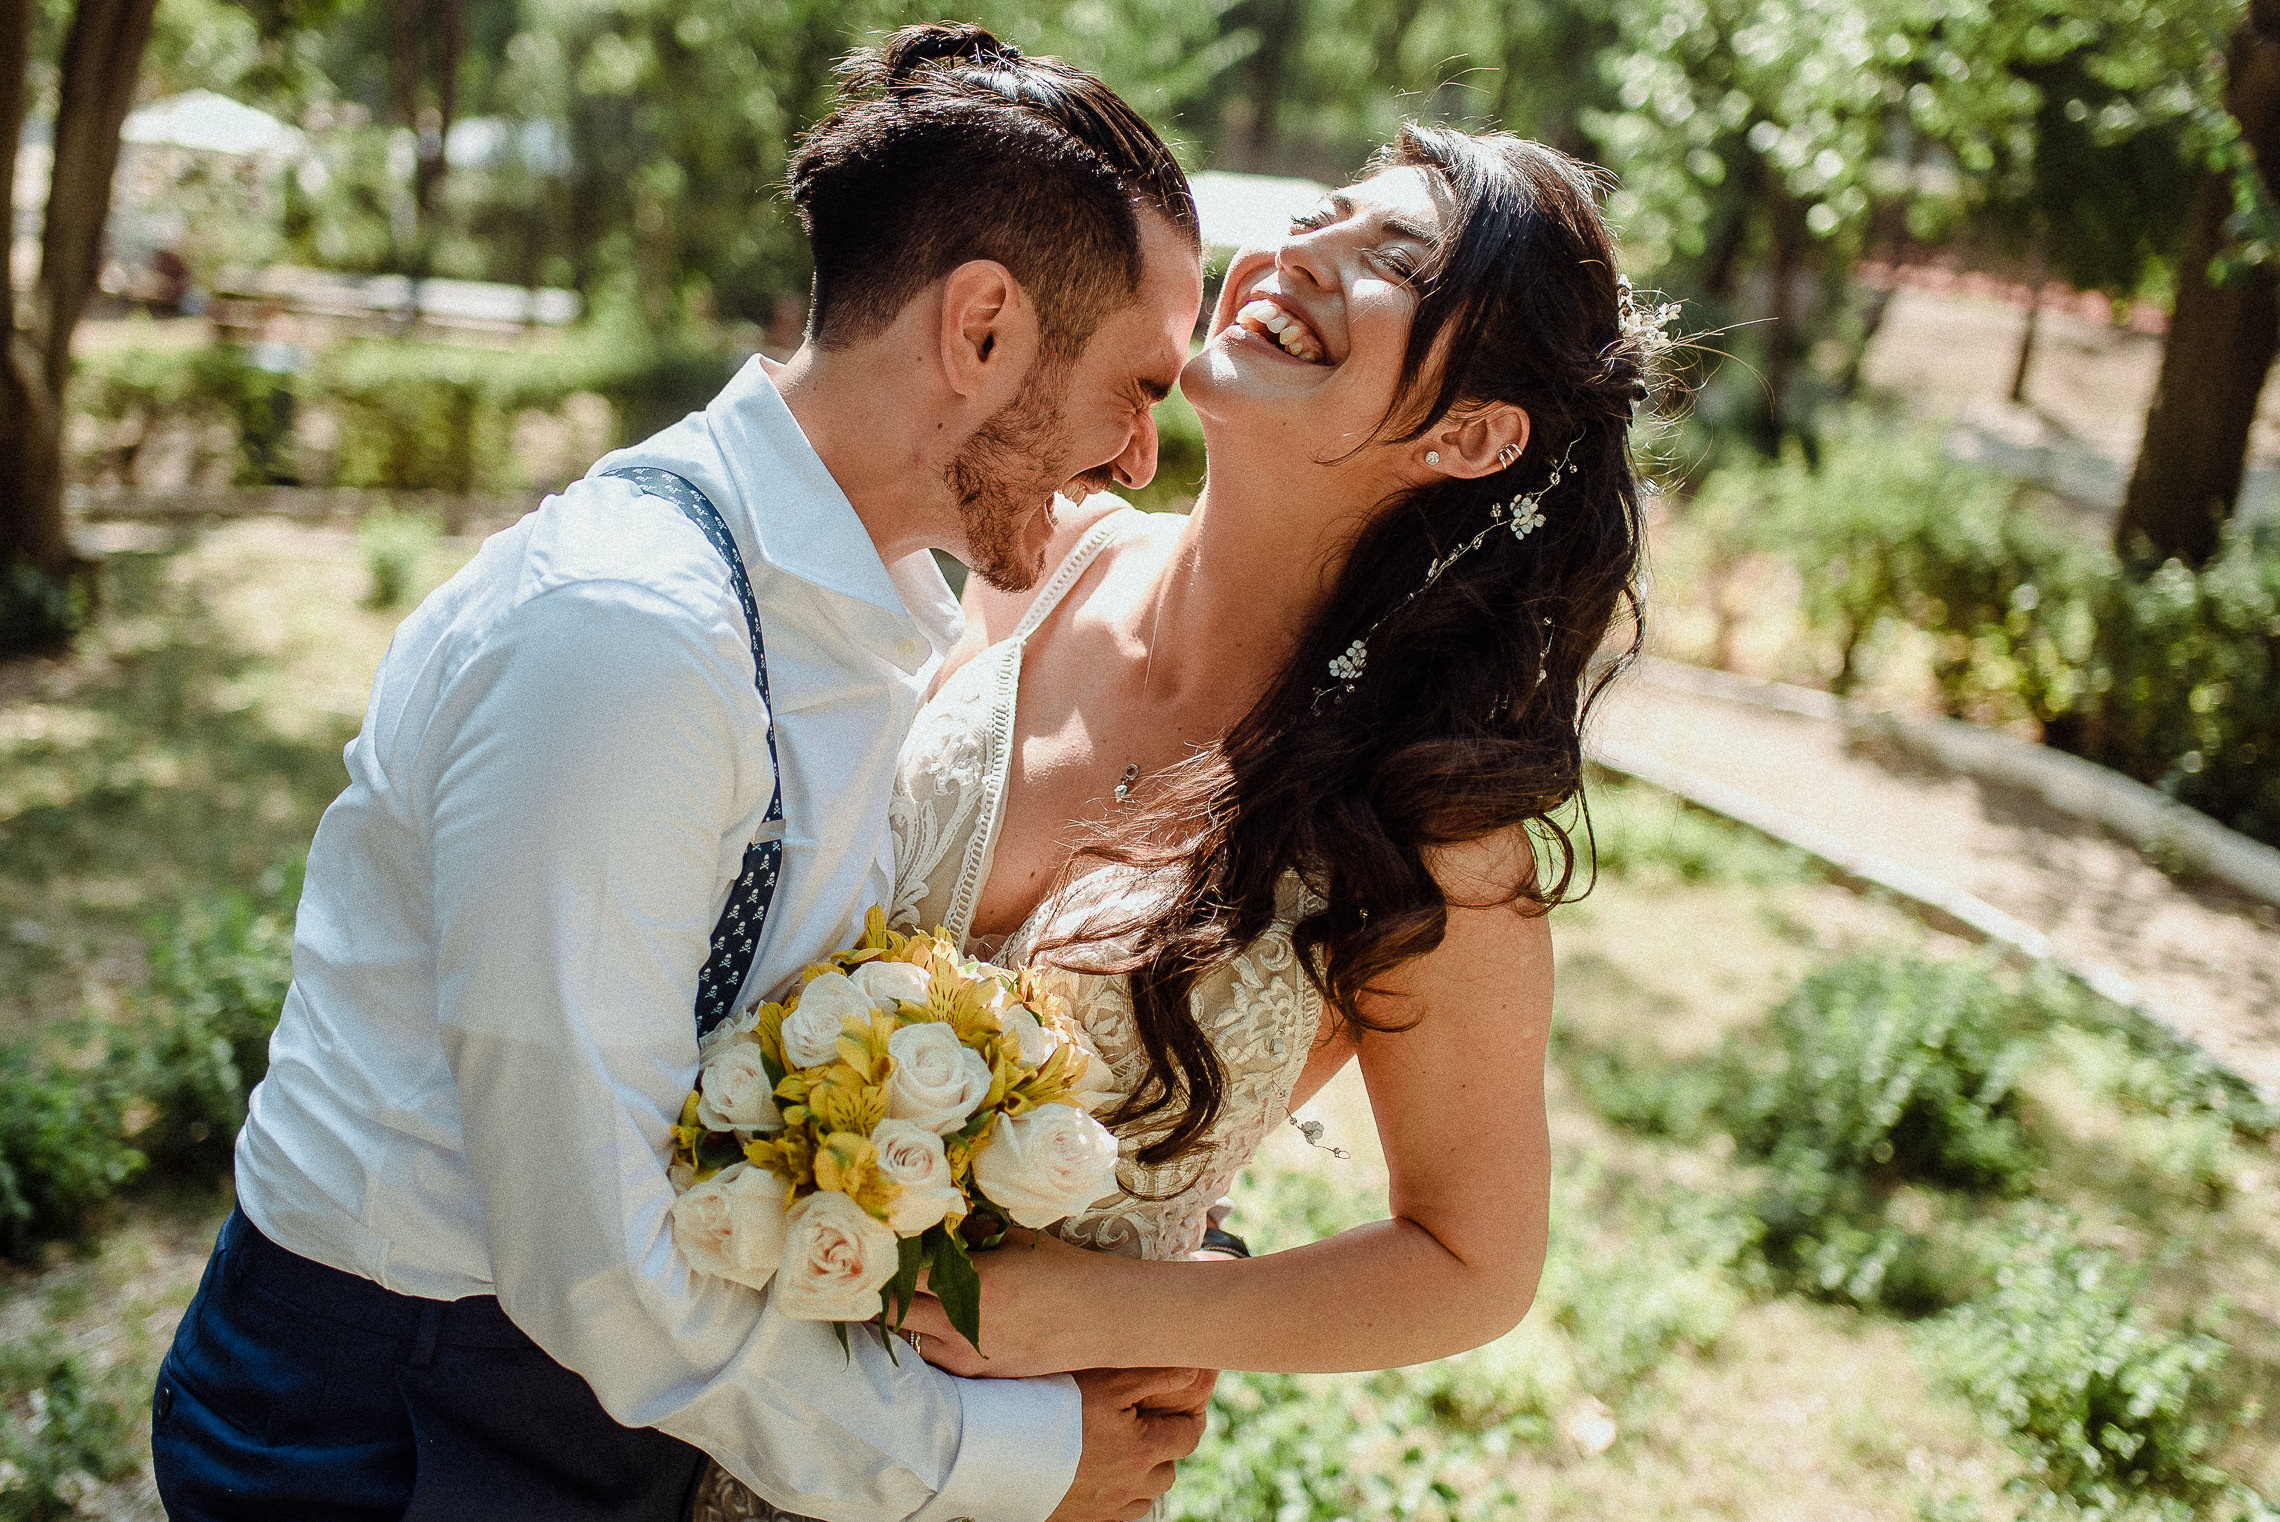 Matrimonio Simbolico Chile : Matrimonio simbólico y civil de valentina y thomas